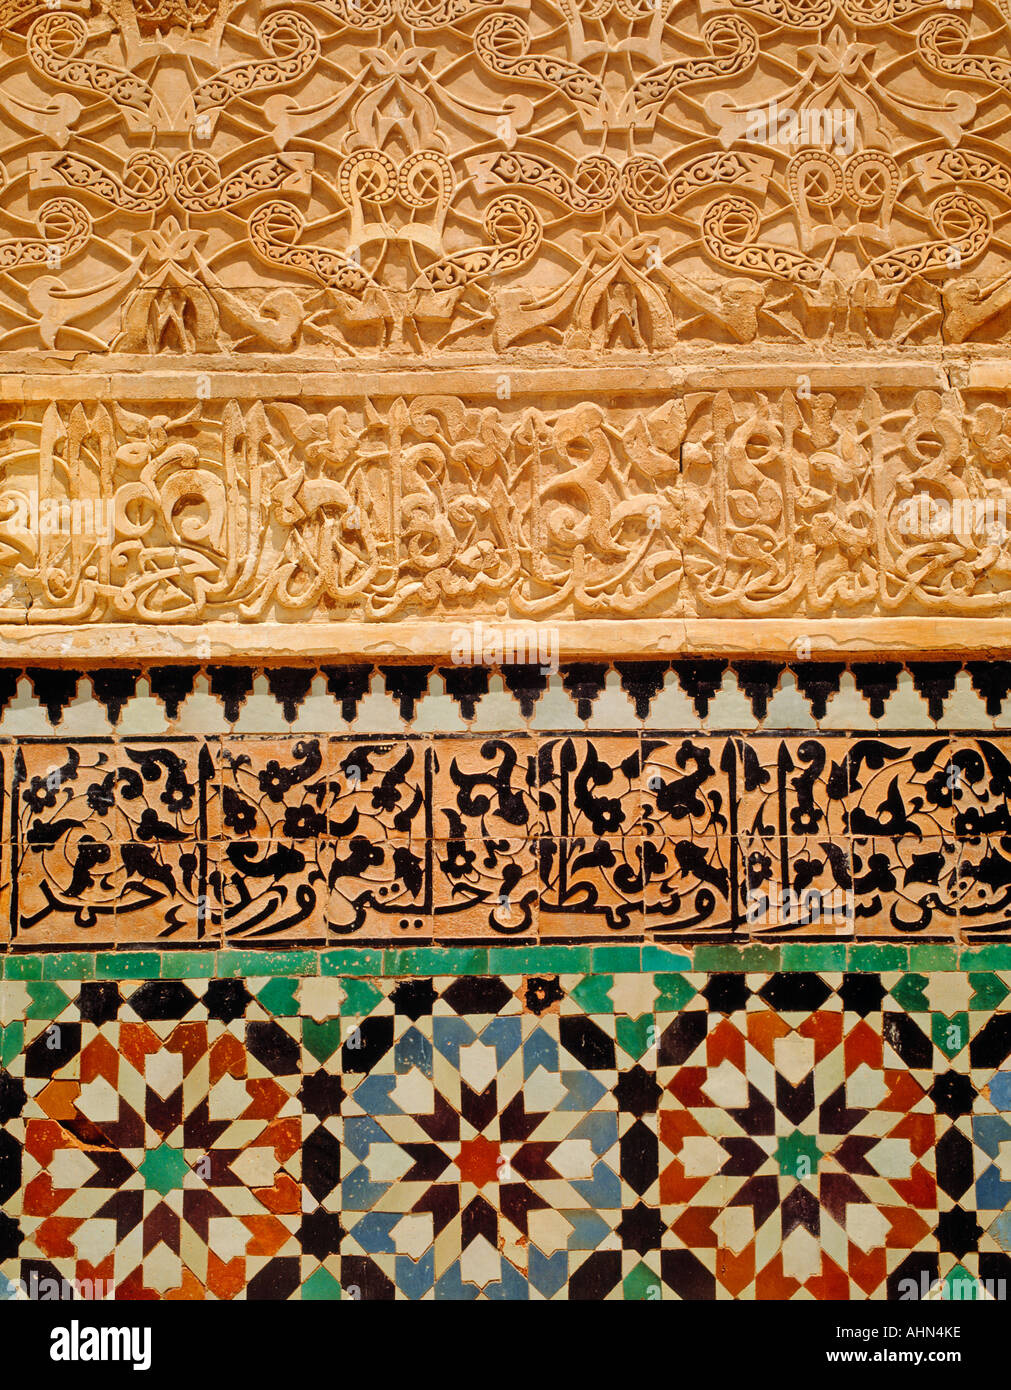 Marrakech Morocco Decorative tiles and plasterwork in Medersa Ben Youssef - Stock Image